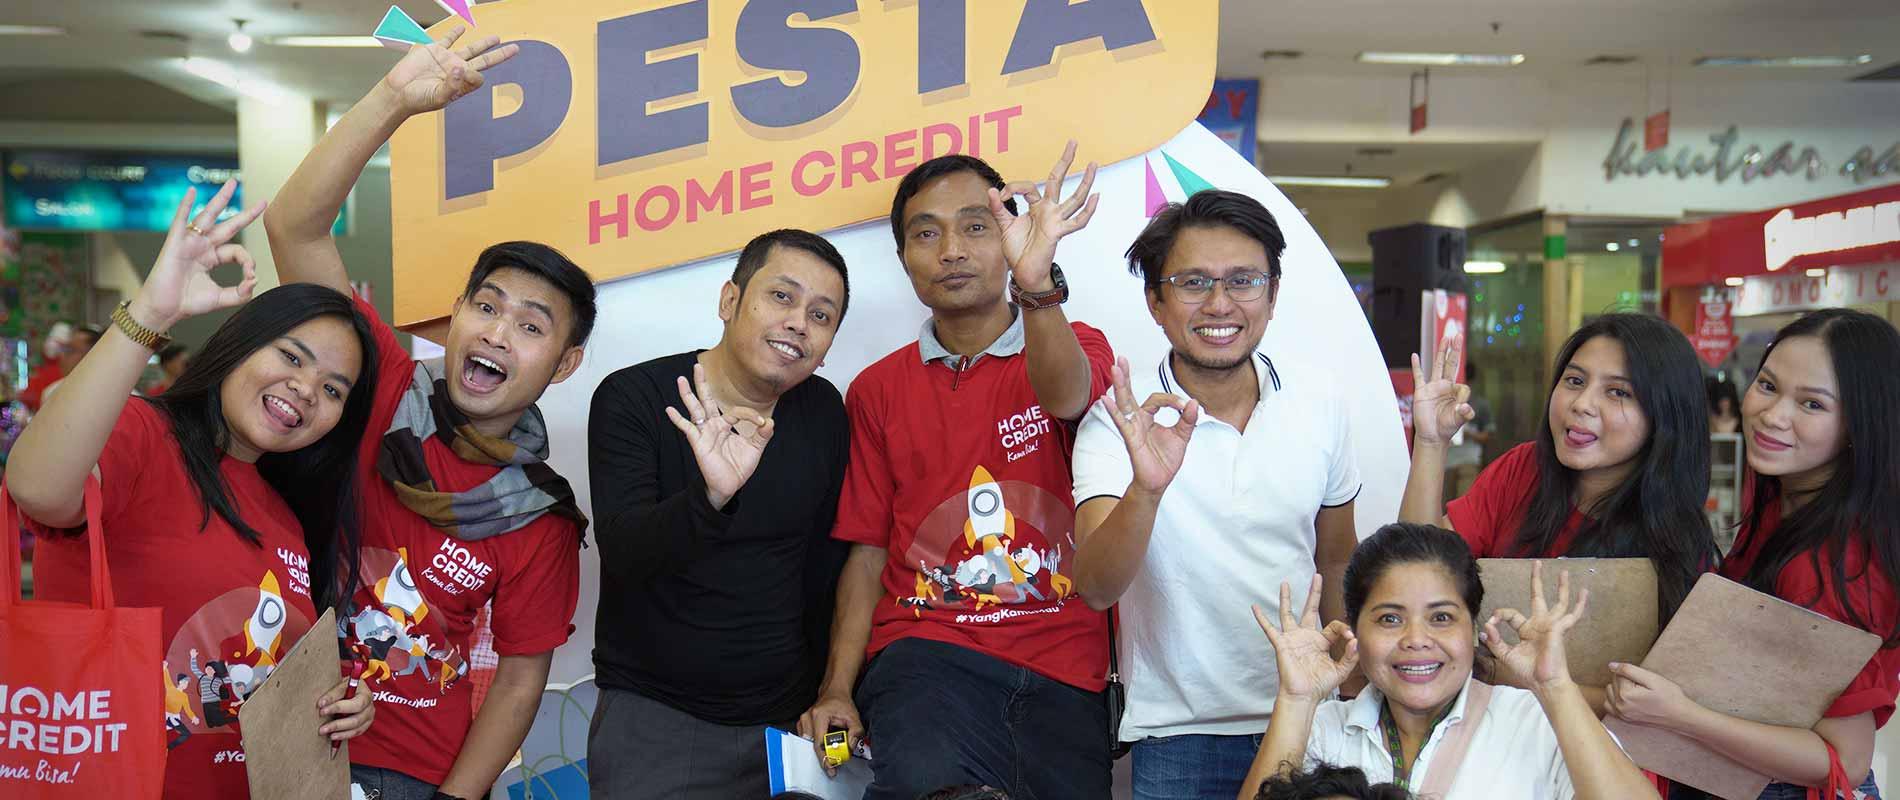 PESTA! Pusat Grosir Cililitan